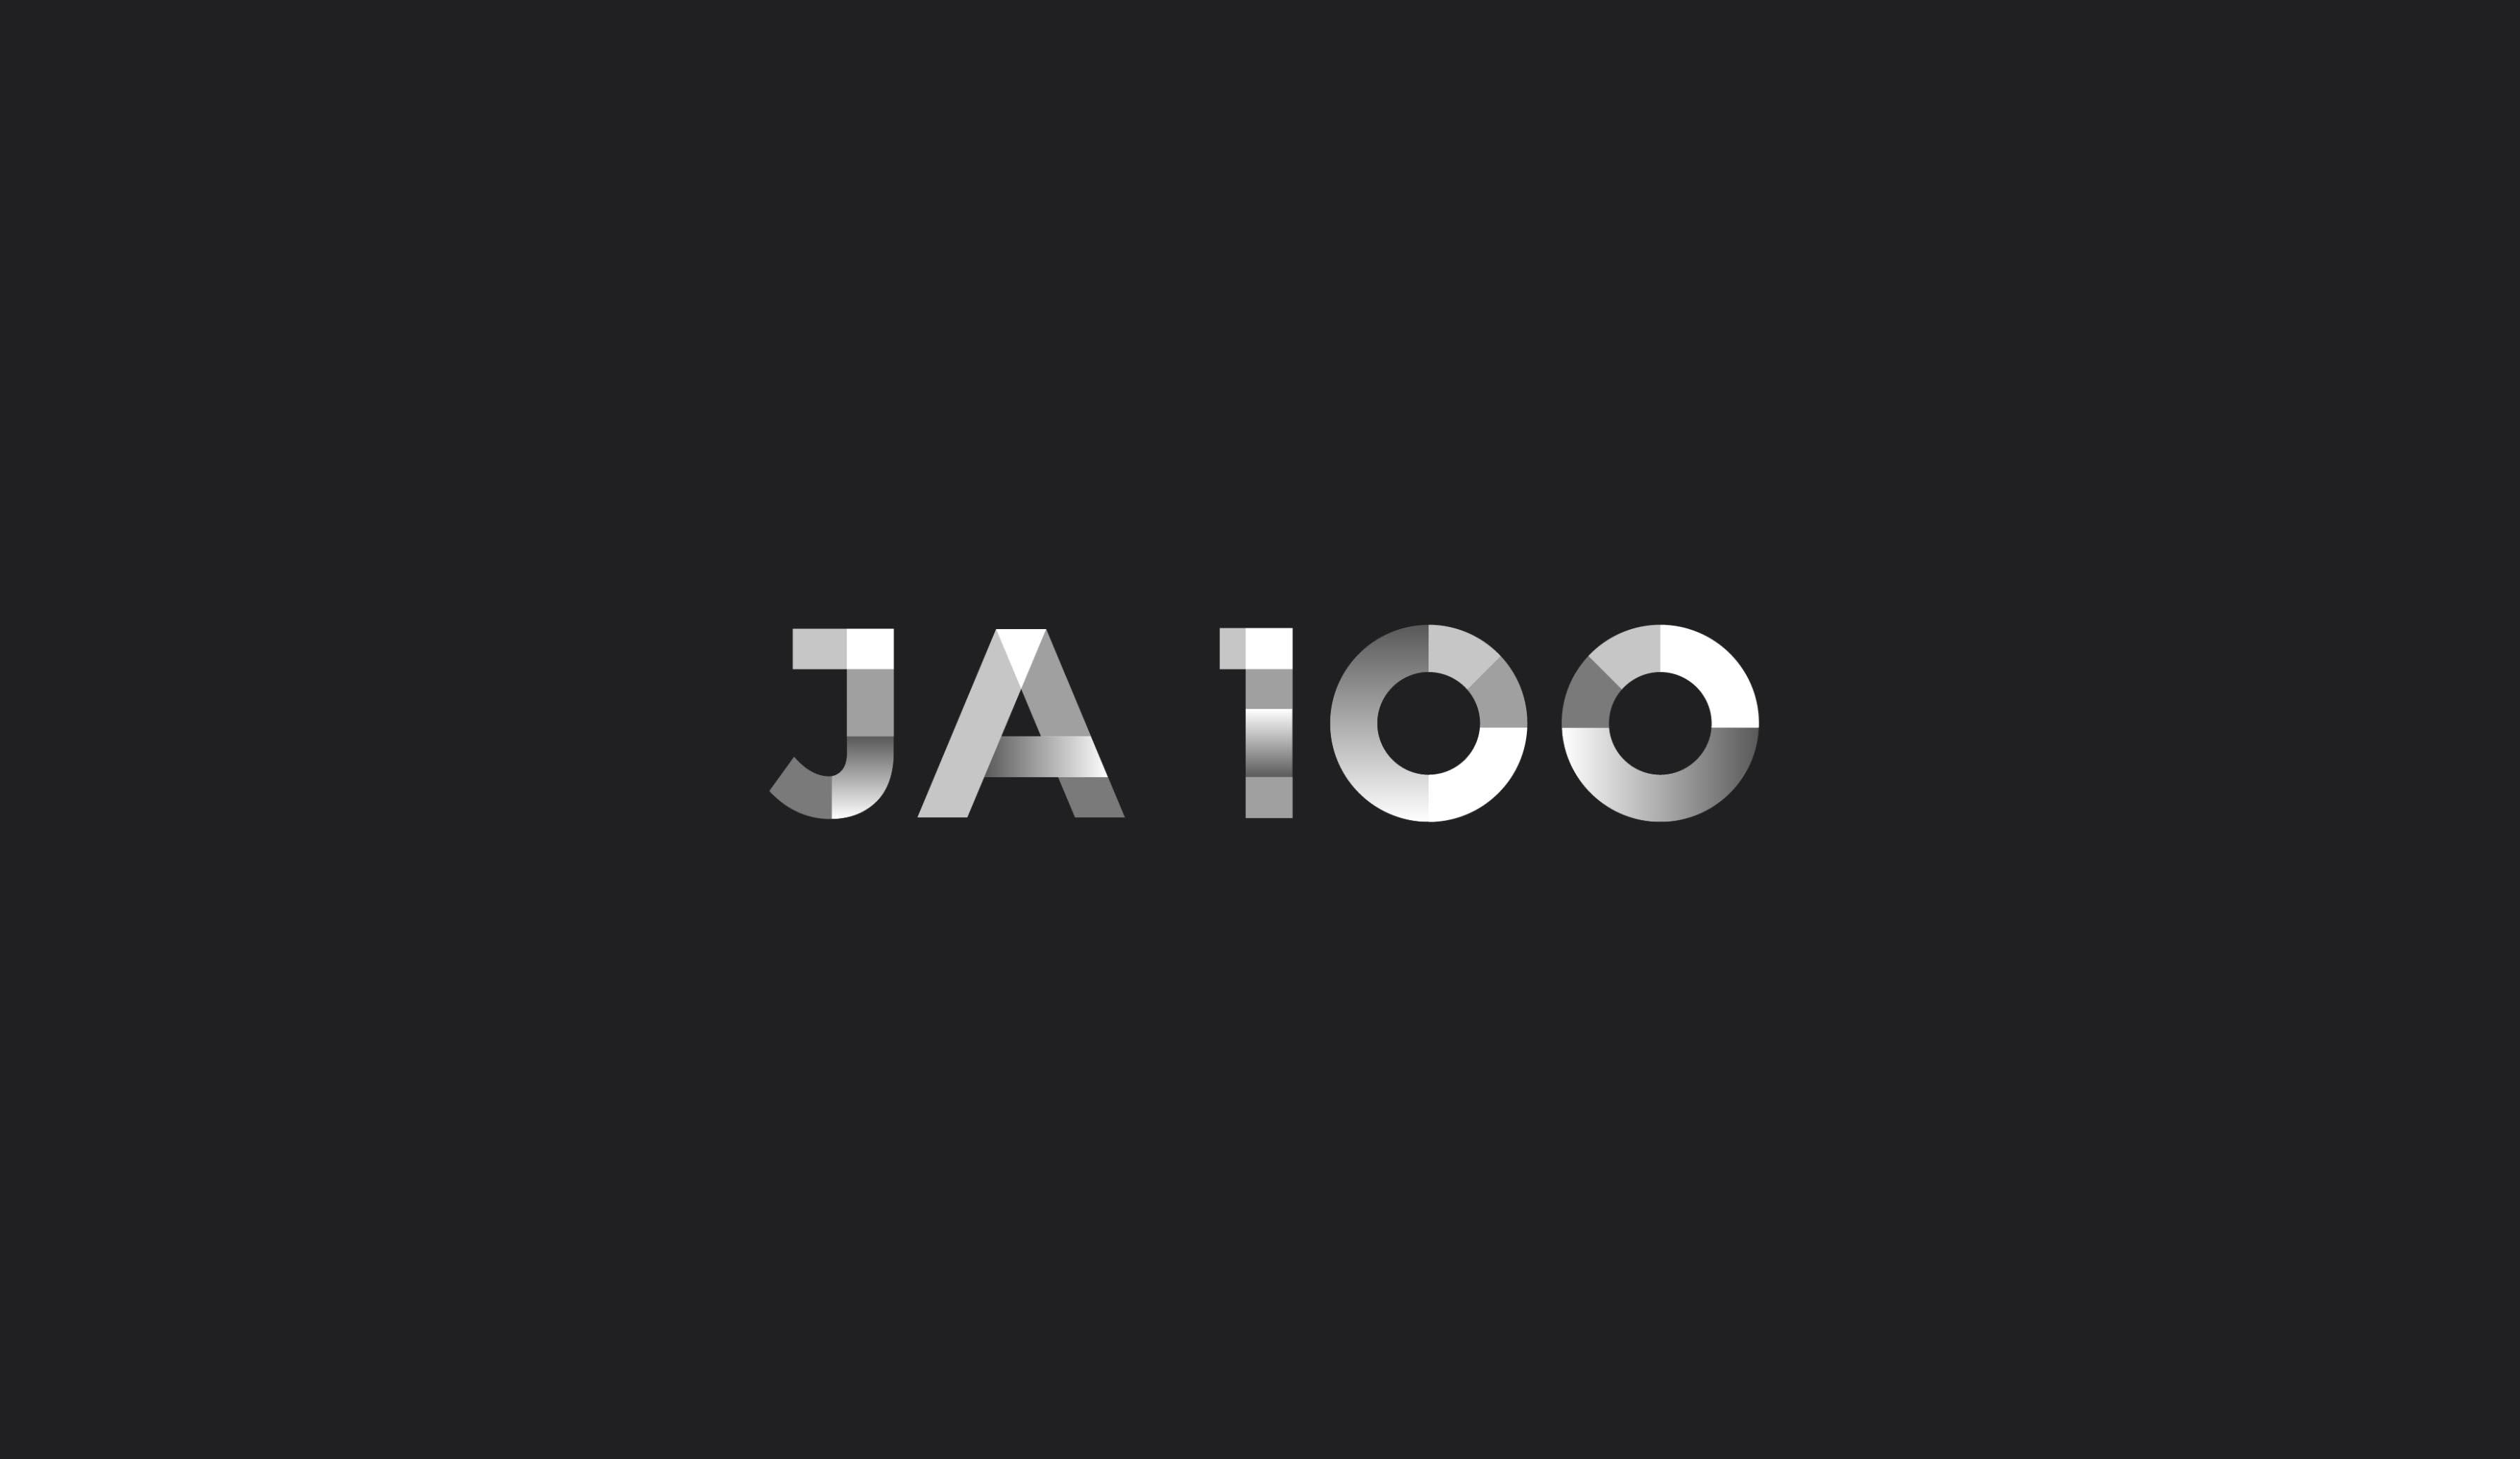 JA 100 logo design